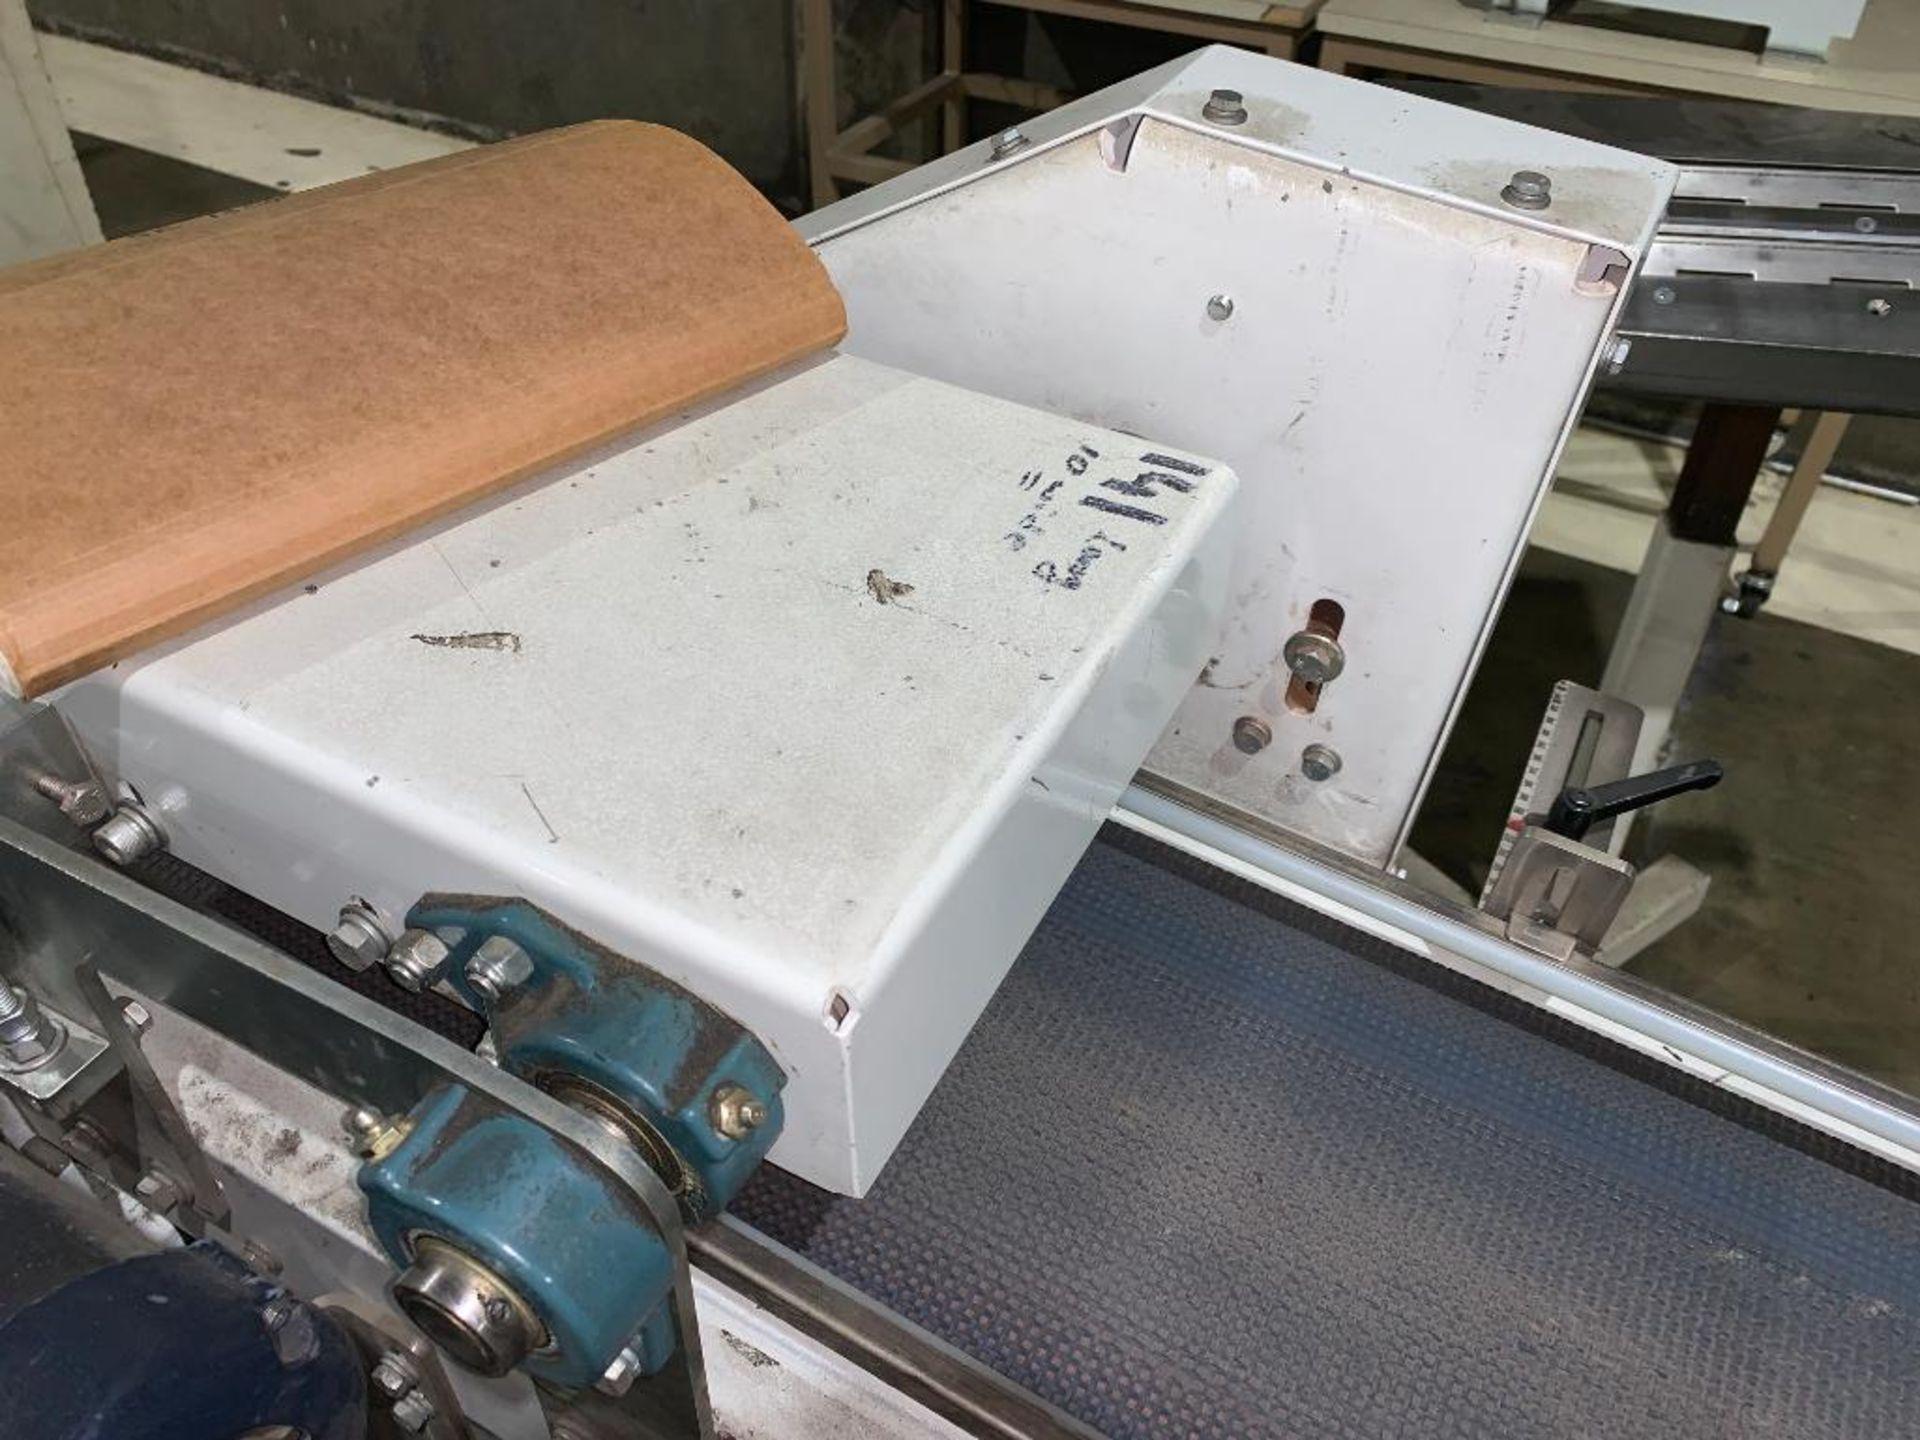 mild steel belt conveyor, 68 in. x 10 in., with box conditioner - Image 3 of 13